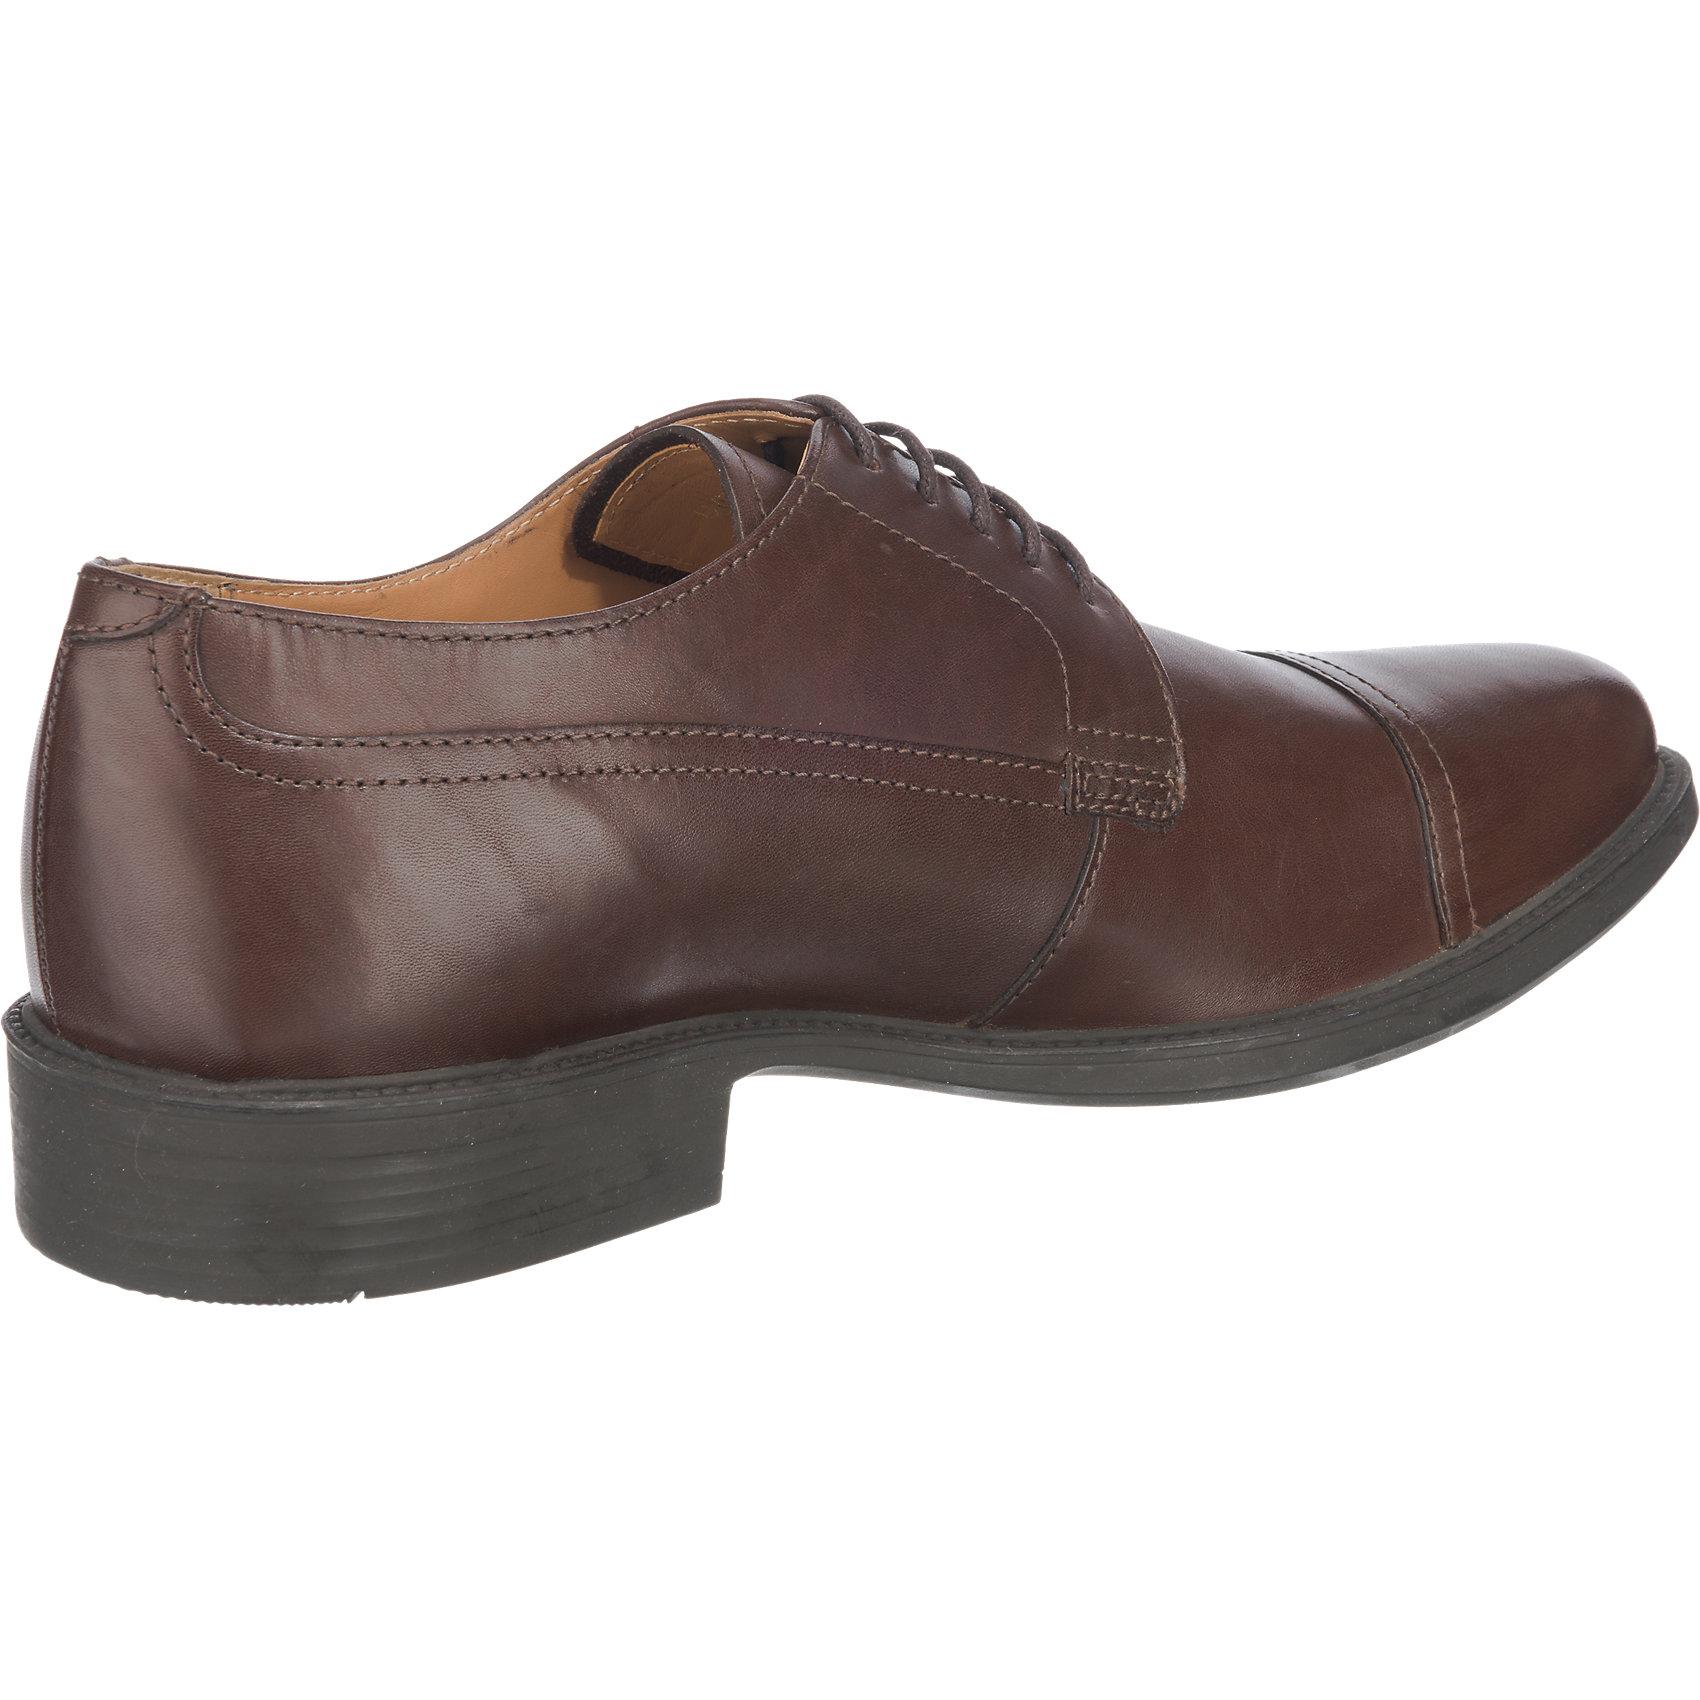 Neu 6845914 GEOX Carnaby Business Schuhe 6845914 Neu für Herren dunkelbraun f8b737